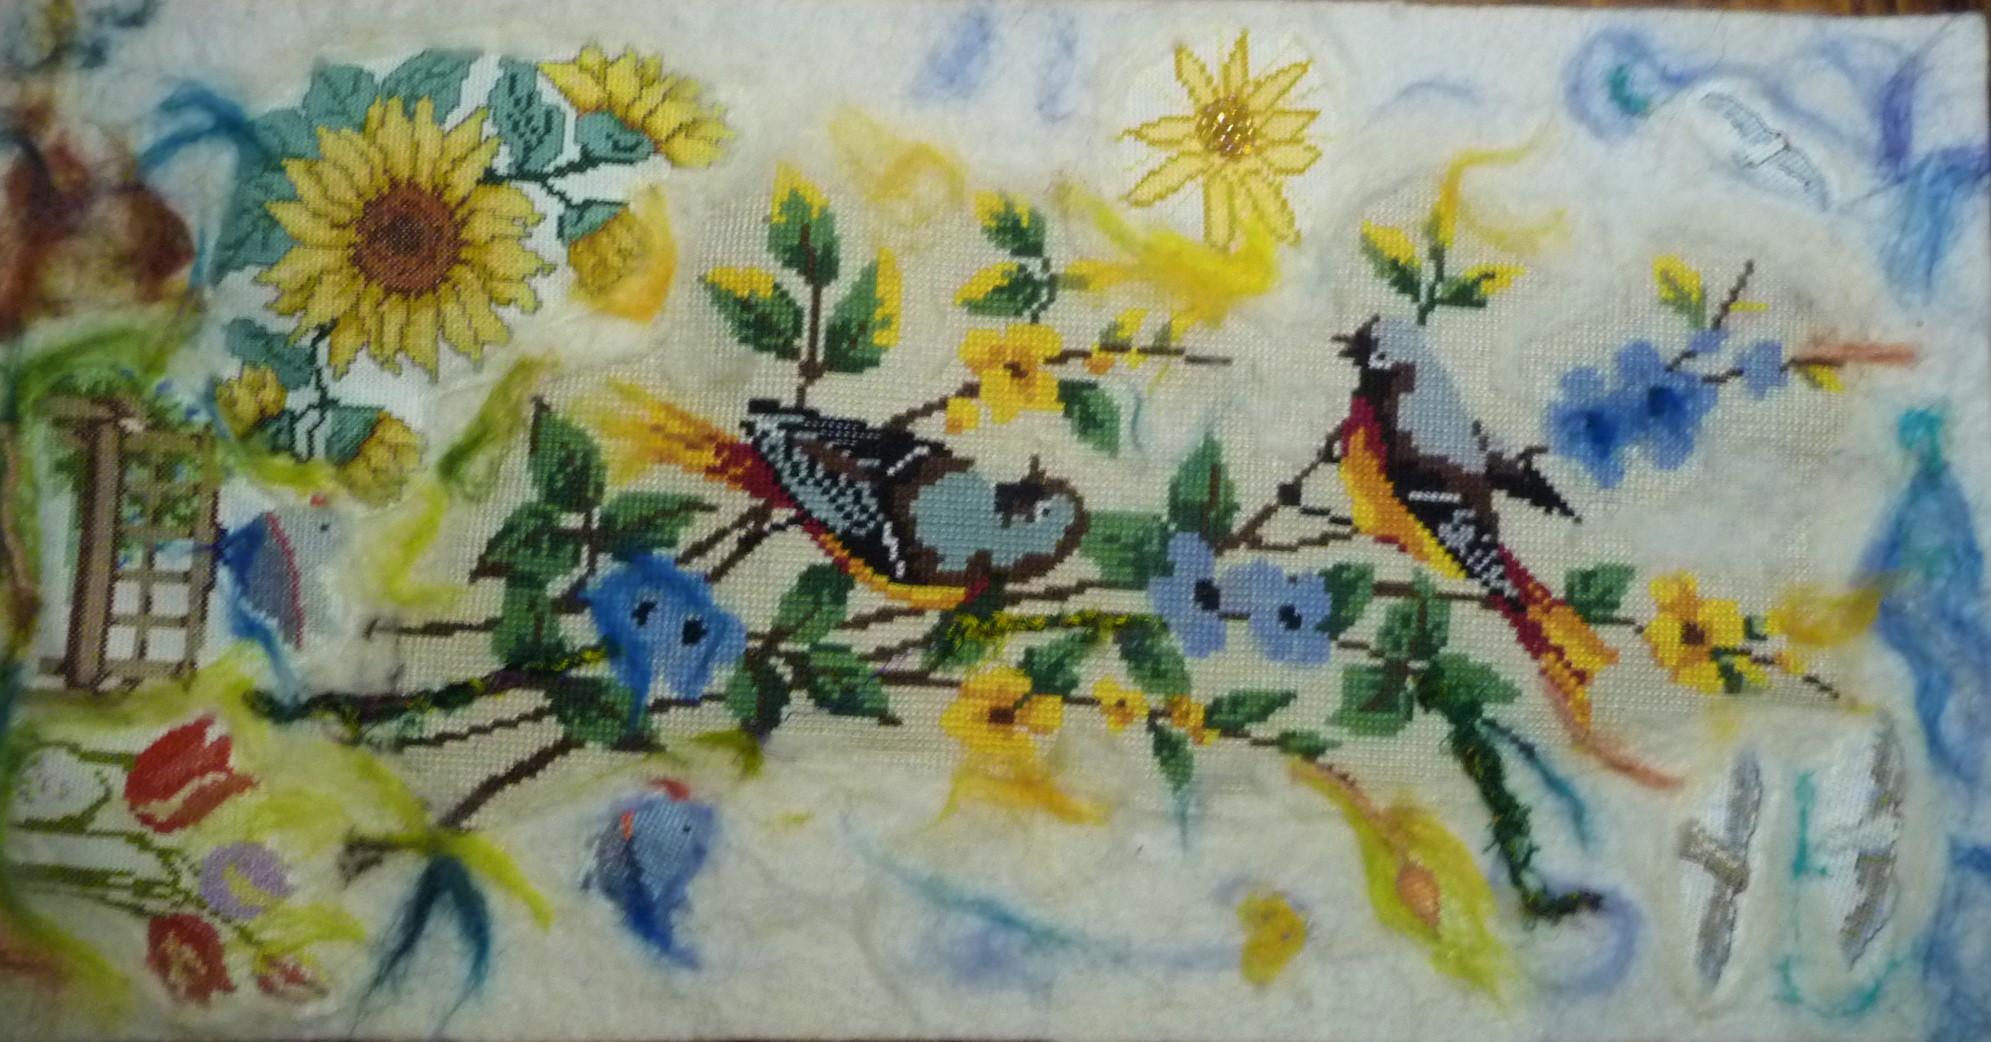 Zomer Trudy Michels vintage boduurwerk, punchen  en borduren